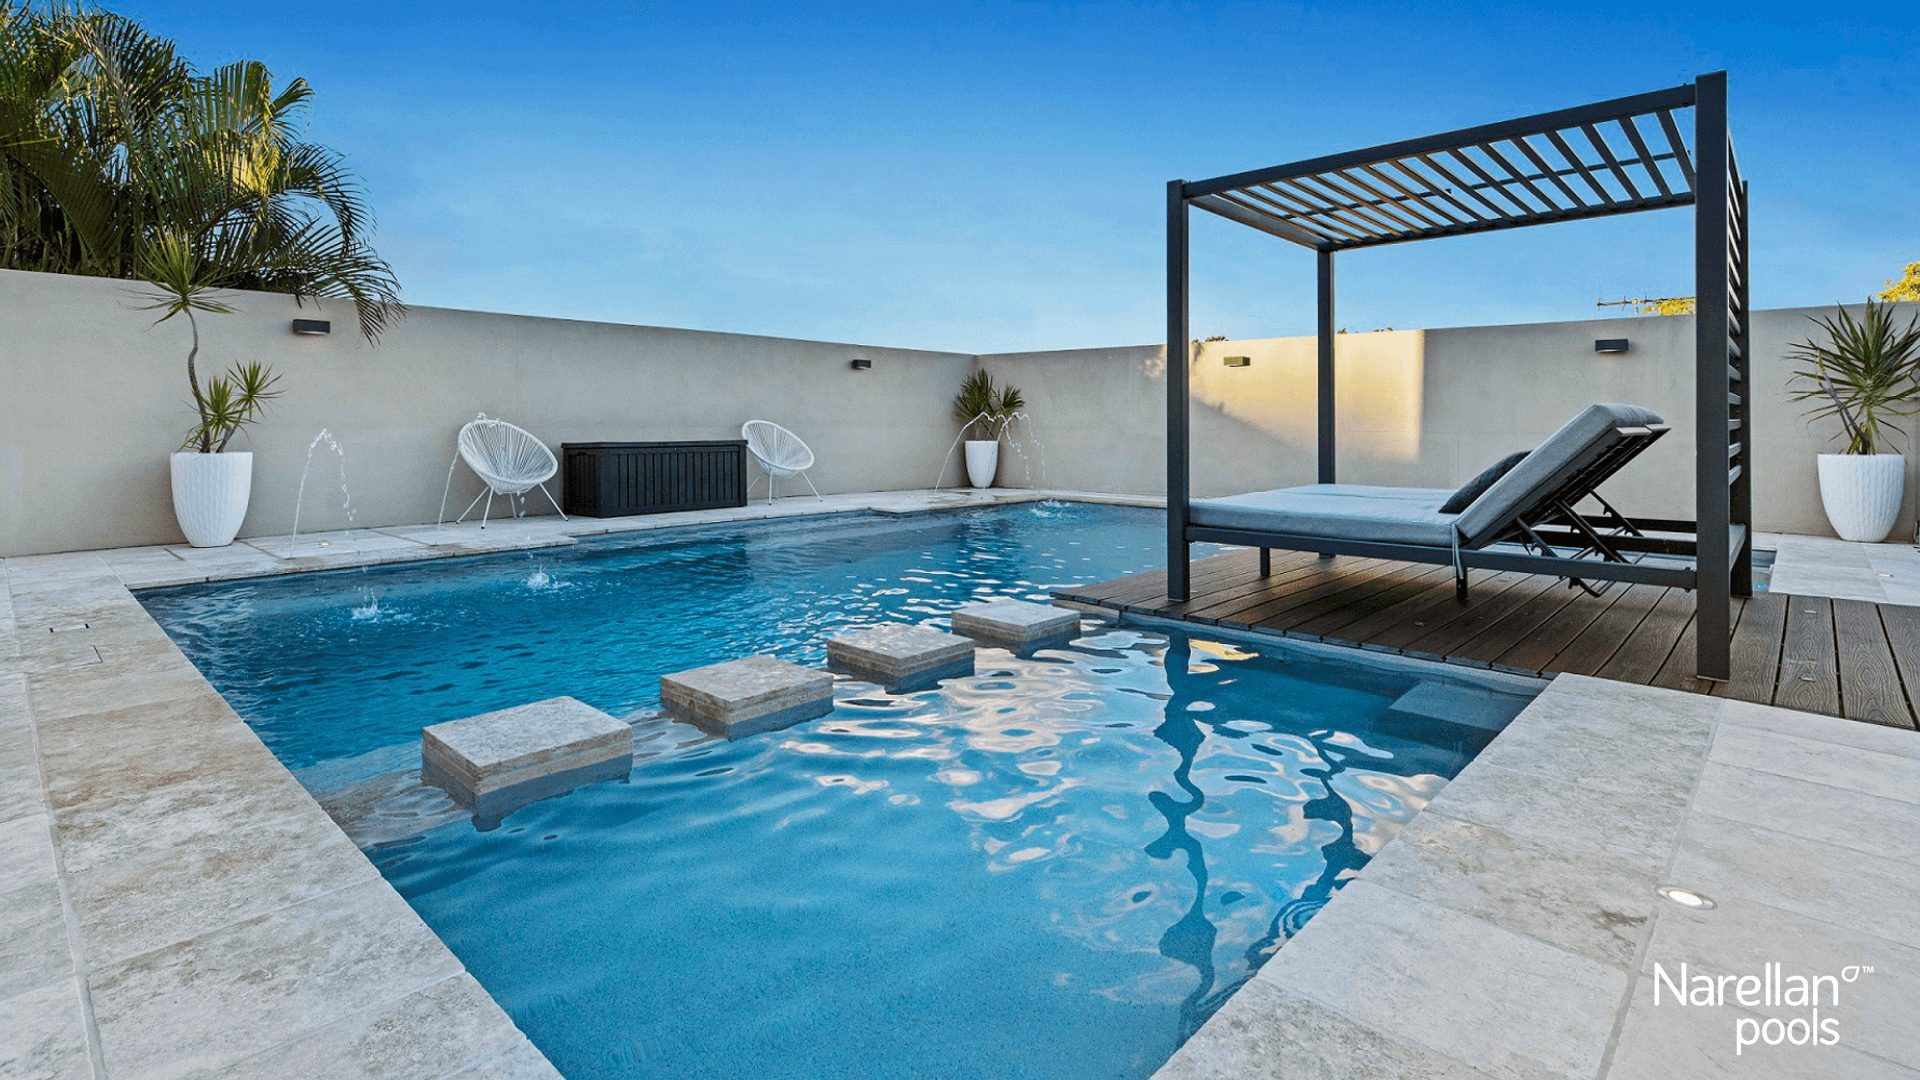 Pataugeoire et spa moderne piscine Narellan Ladouceur paysagiste